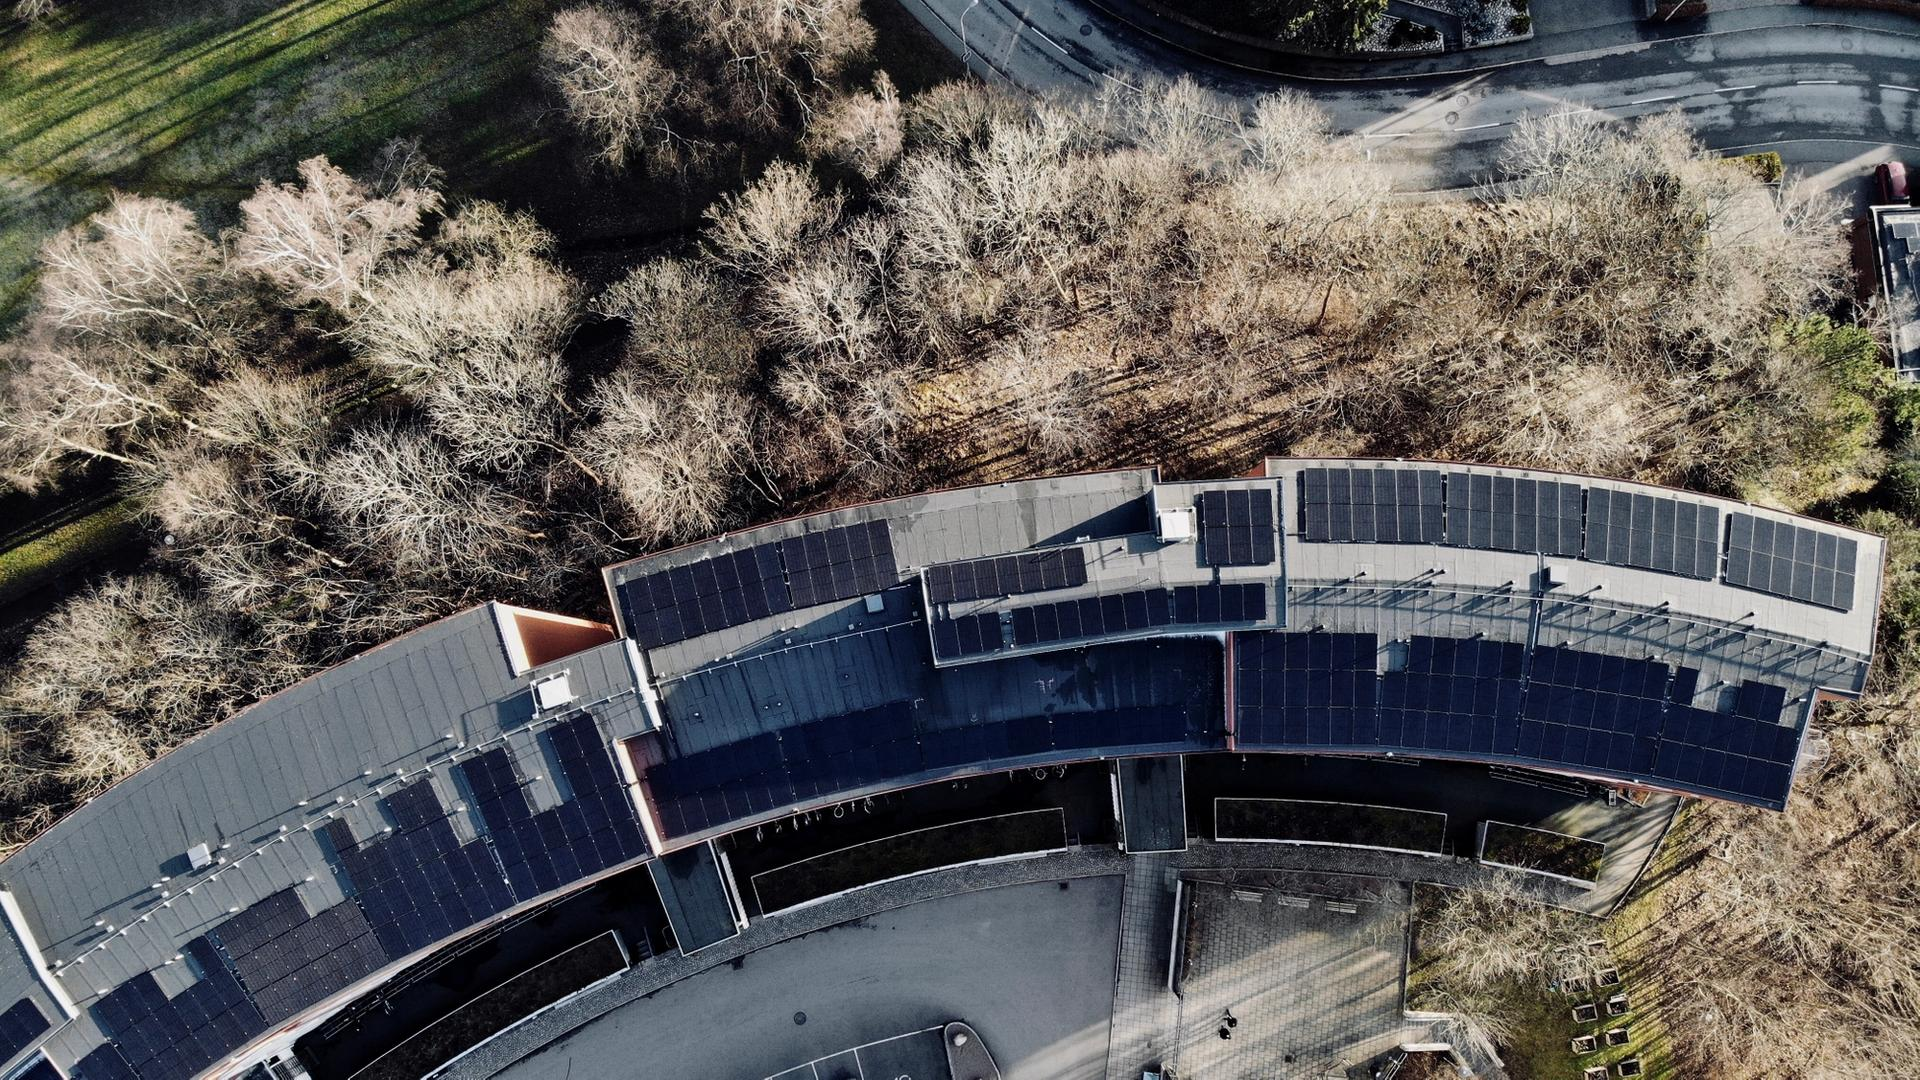 Housing Cooperative Solar Energy System